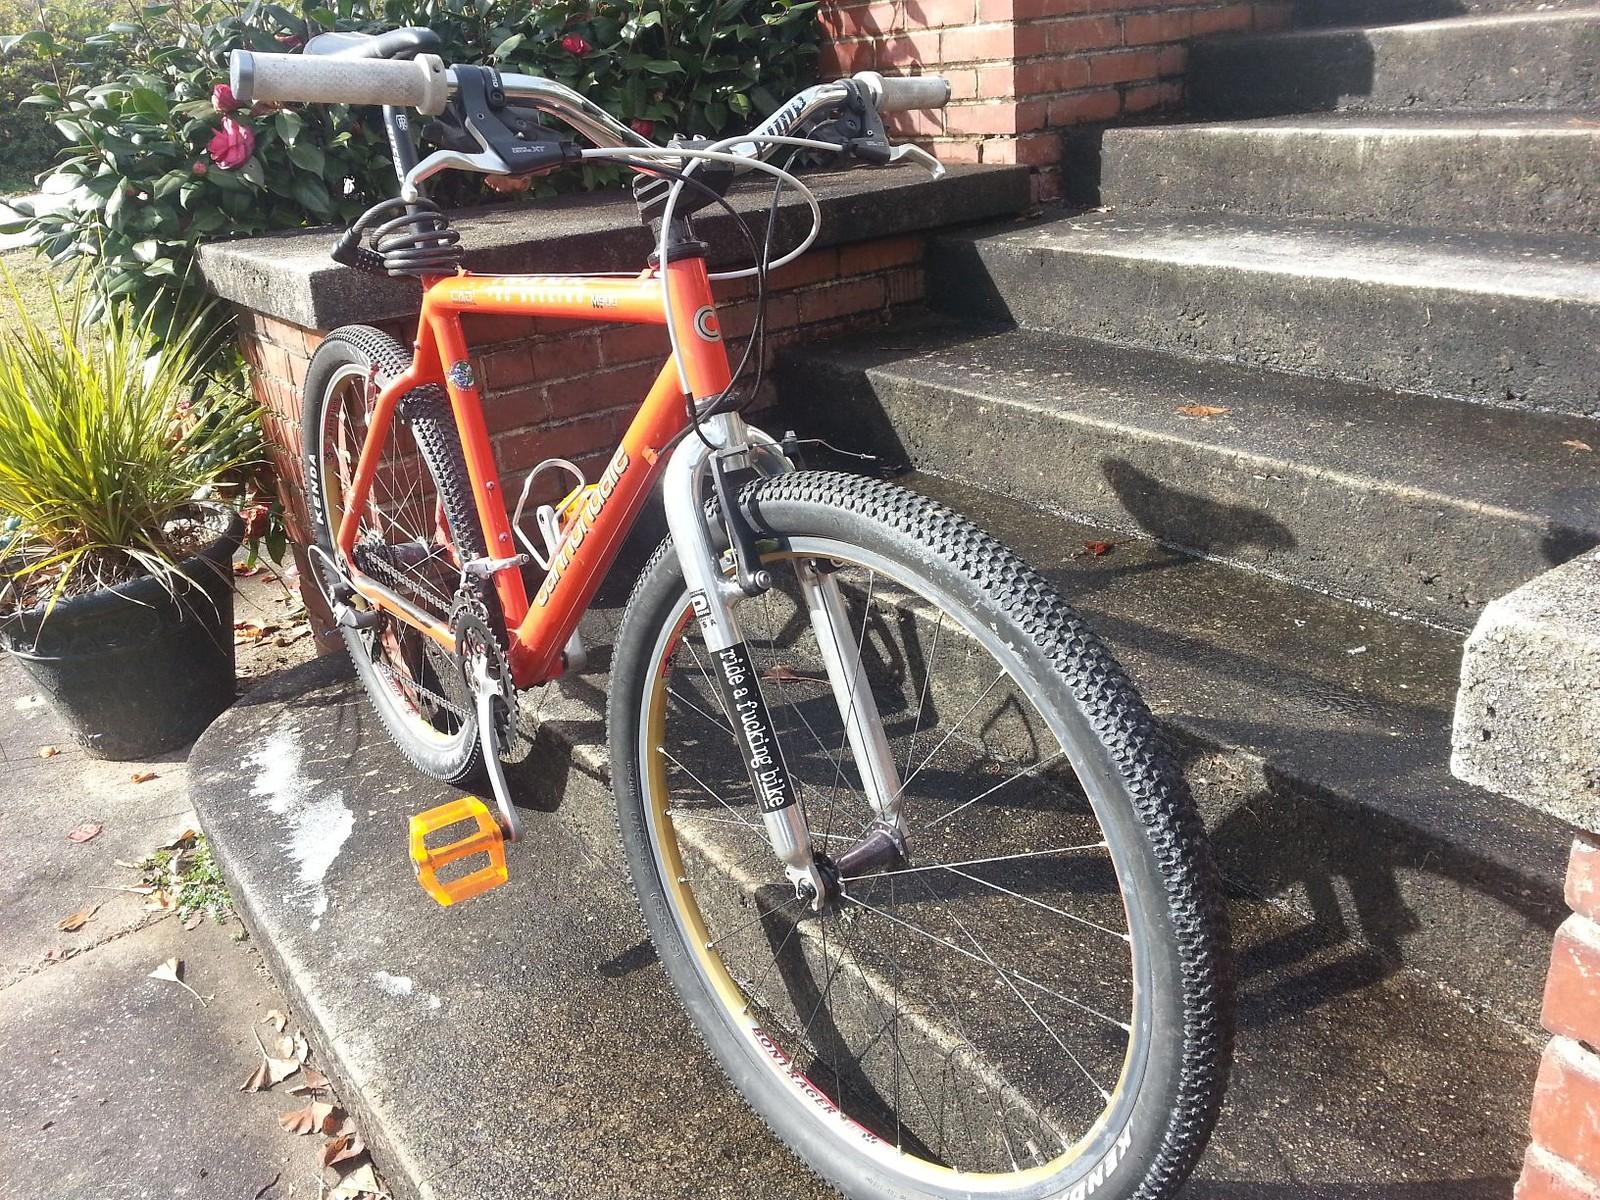 Cannondale M900 Commuter bike